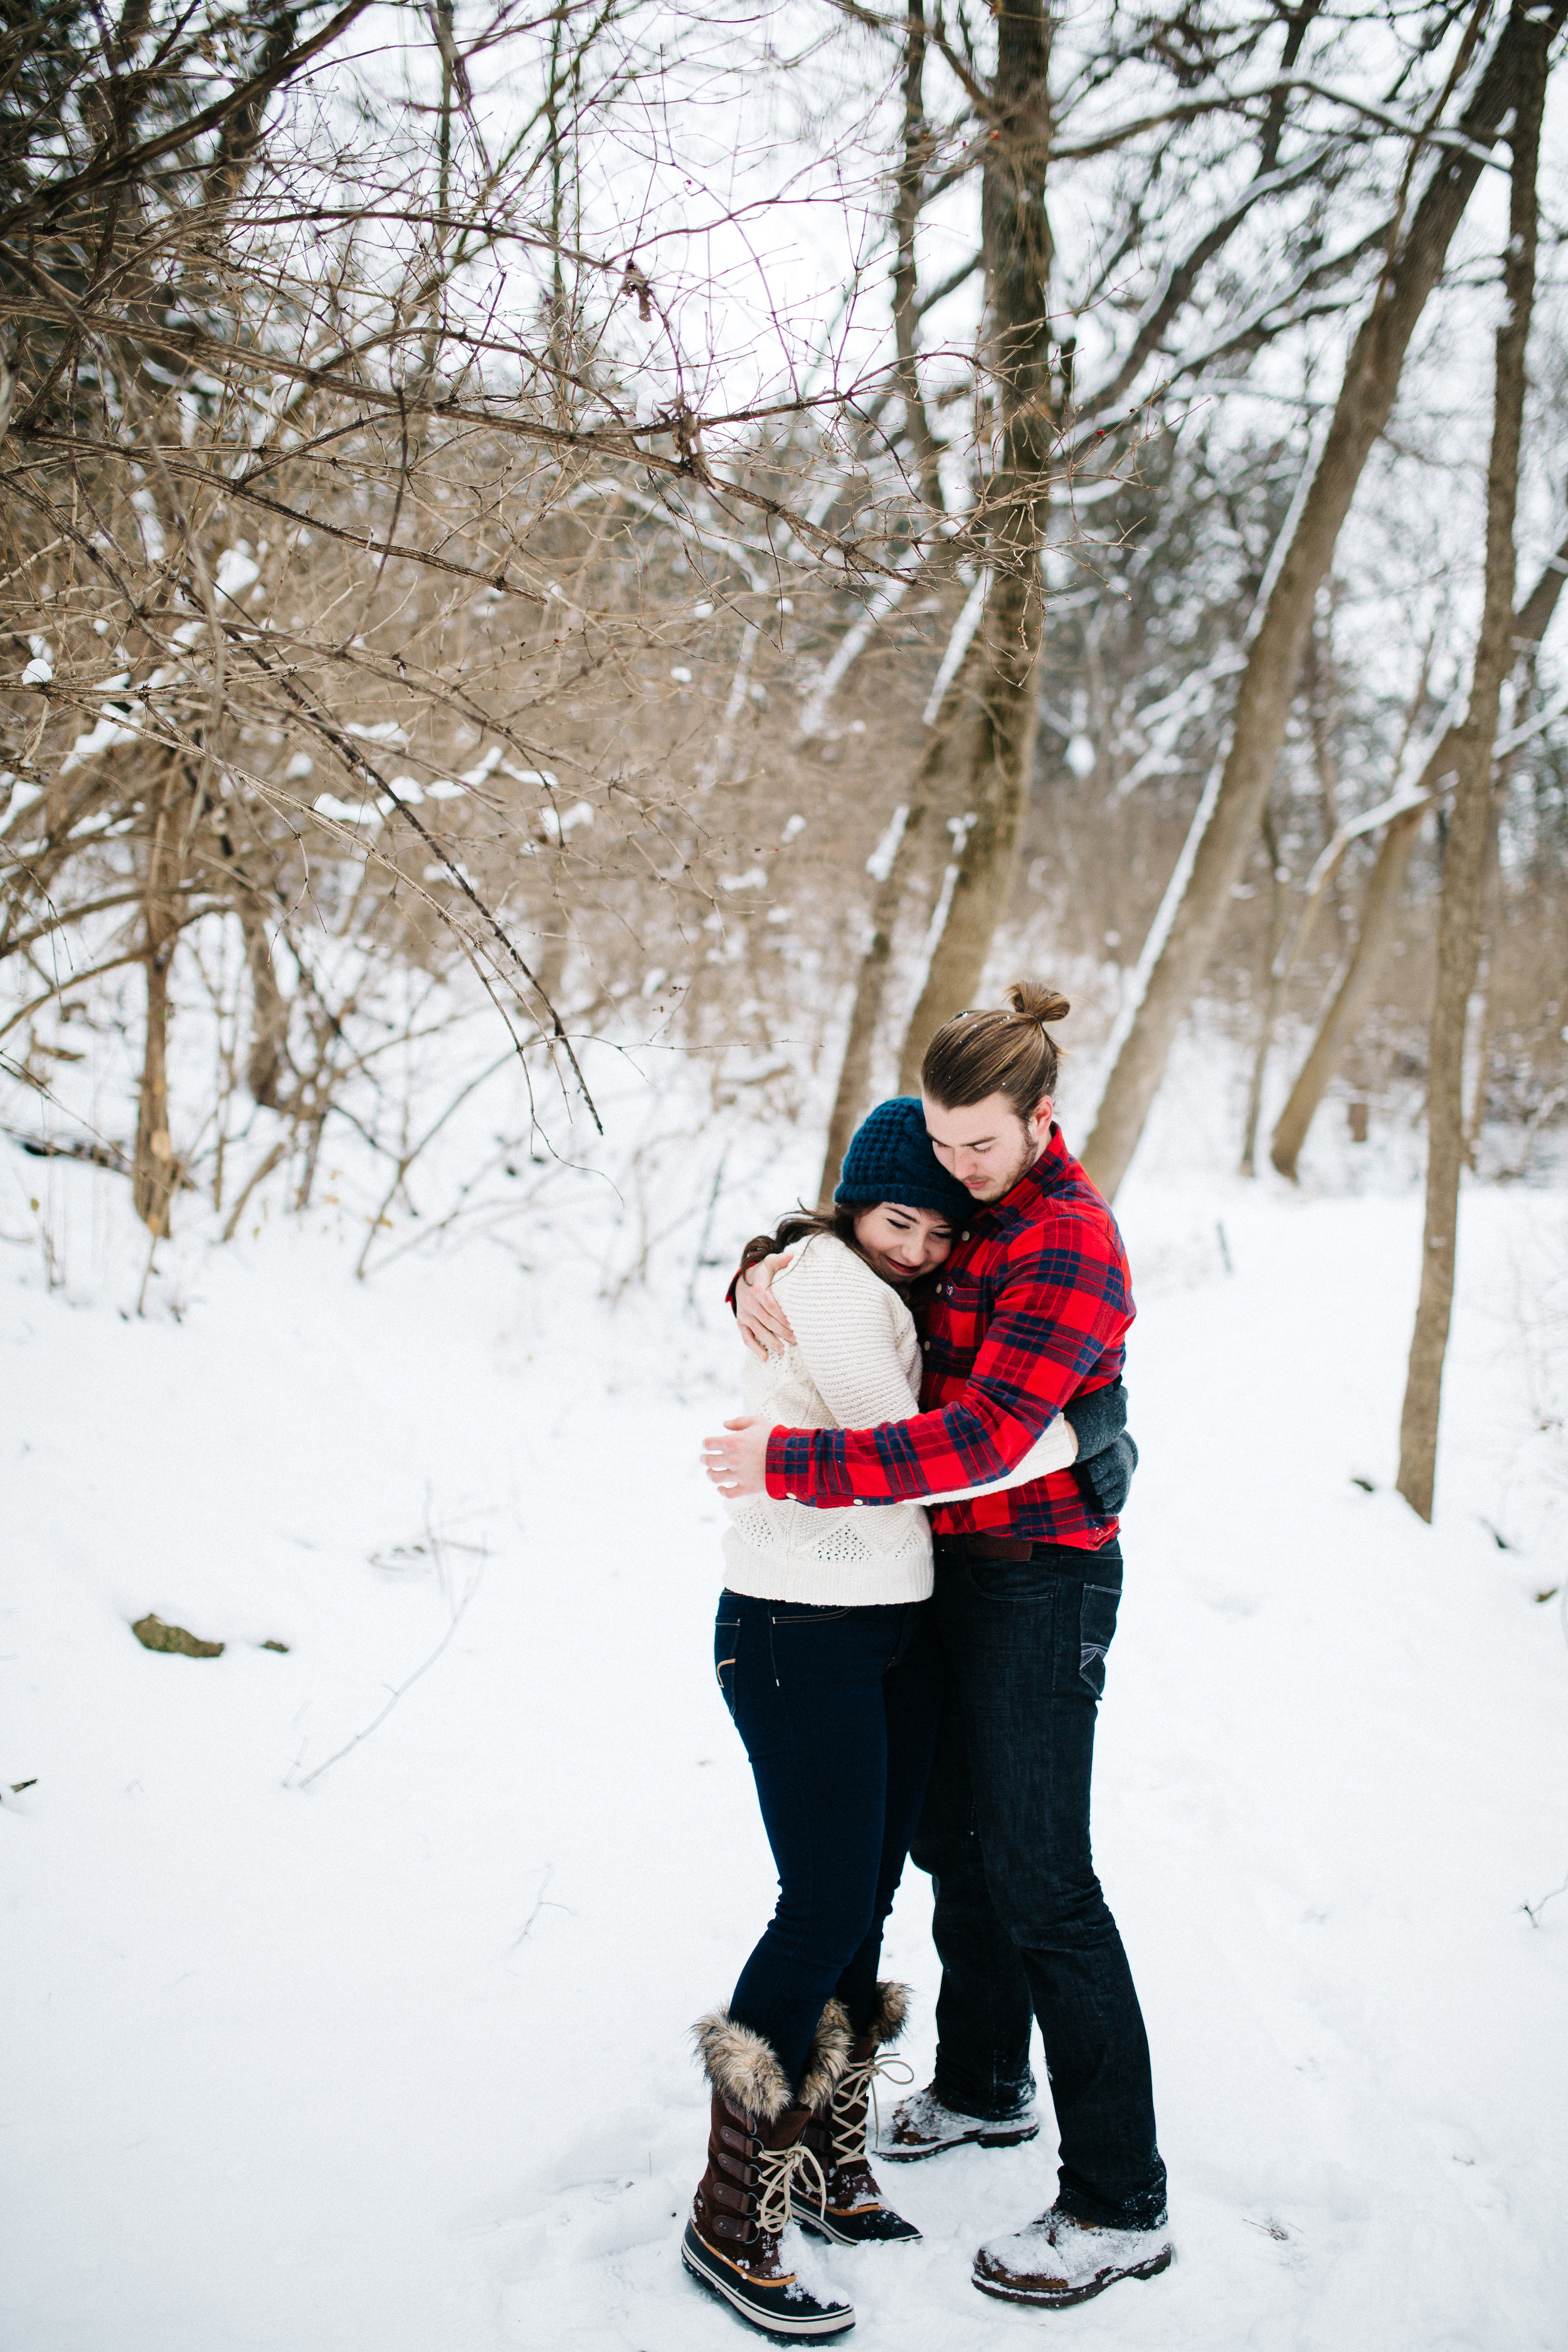 snow+m+o+d+e+l+s-55.jpg